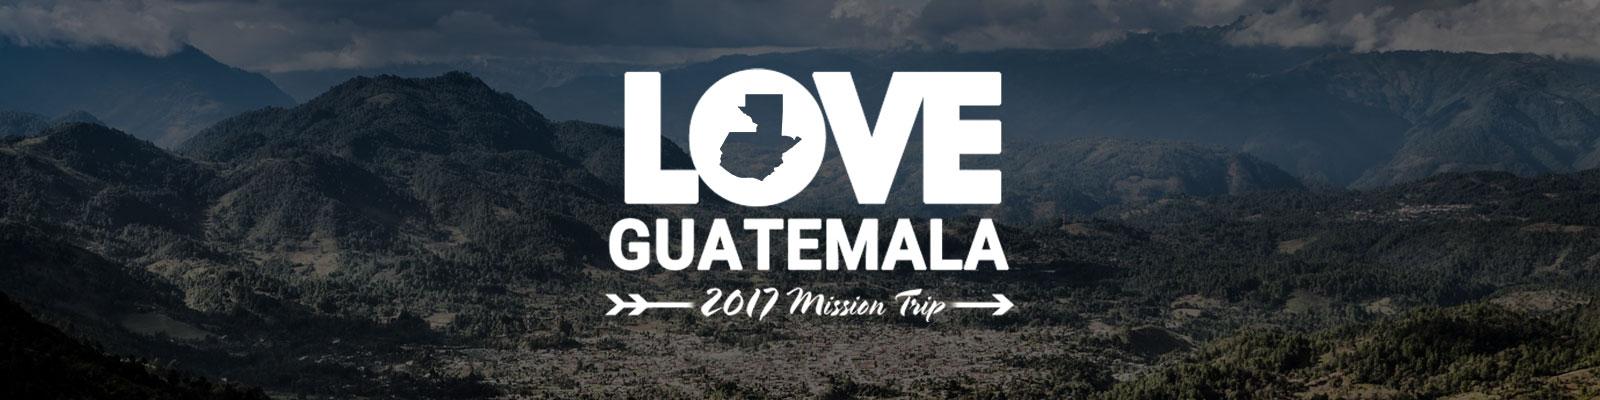 guatemala-header